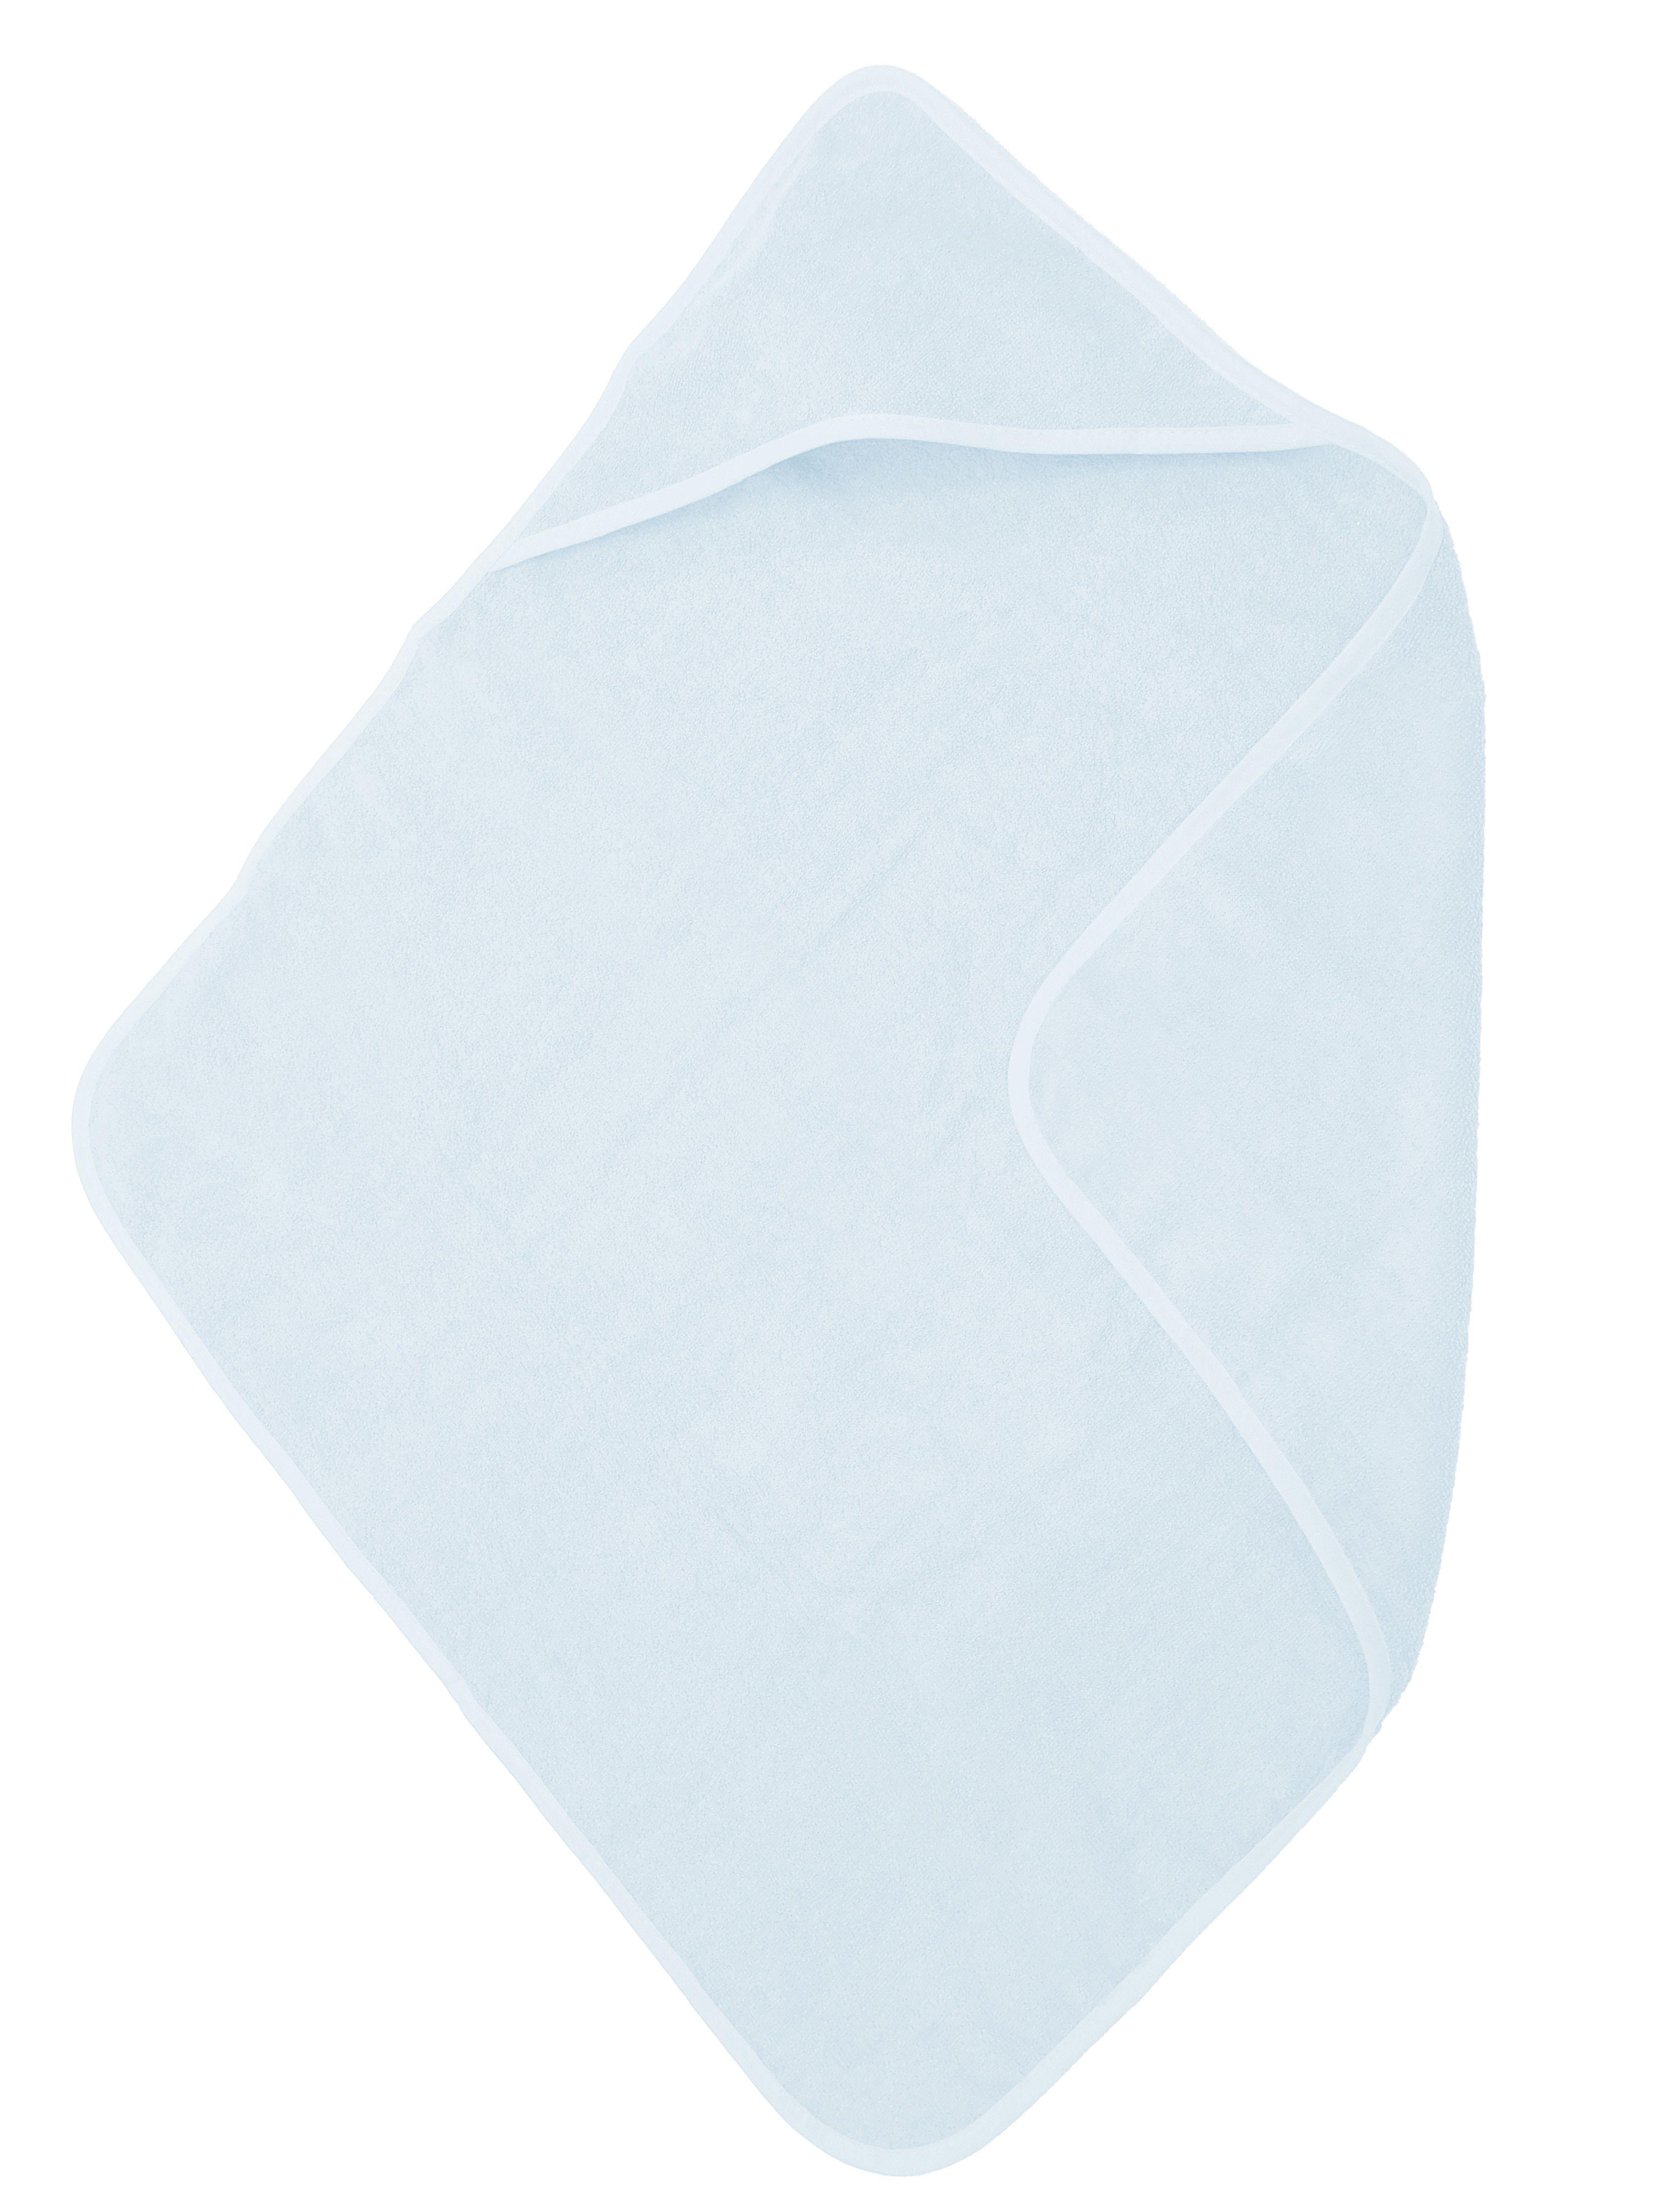 The One Baby Handdoek 75x75 Light Blue